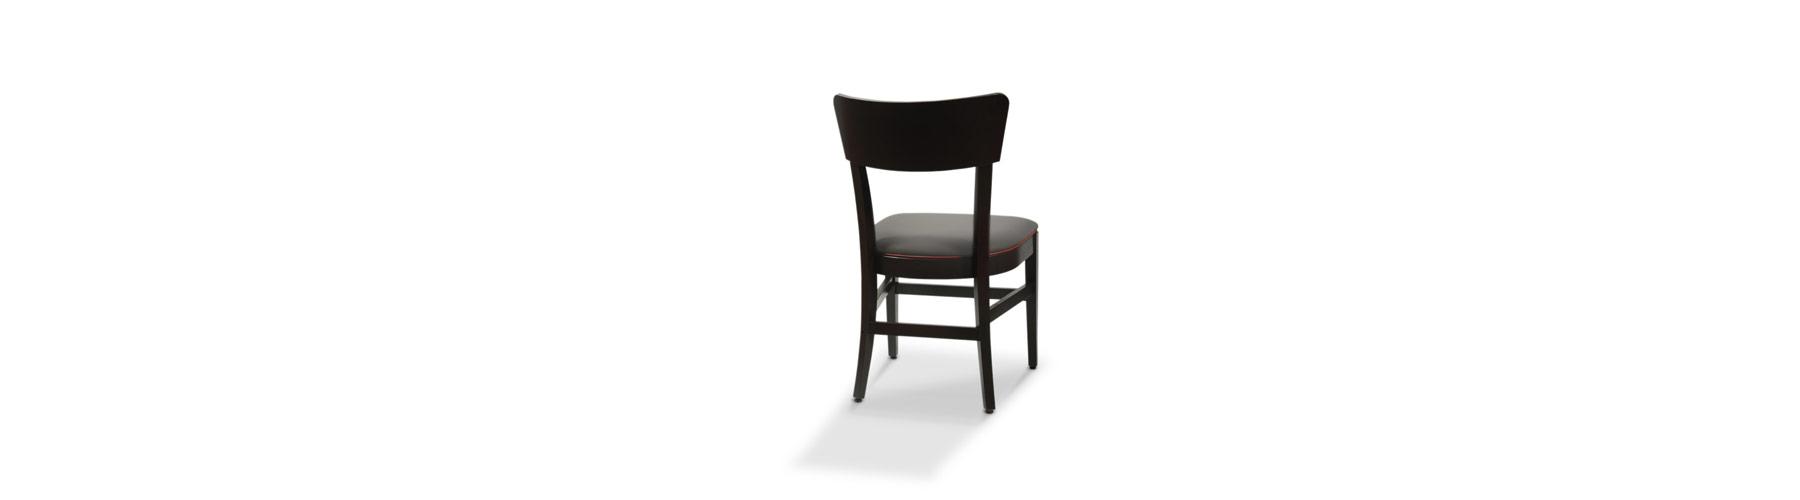 Madison - arrière - Chaise William